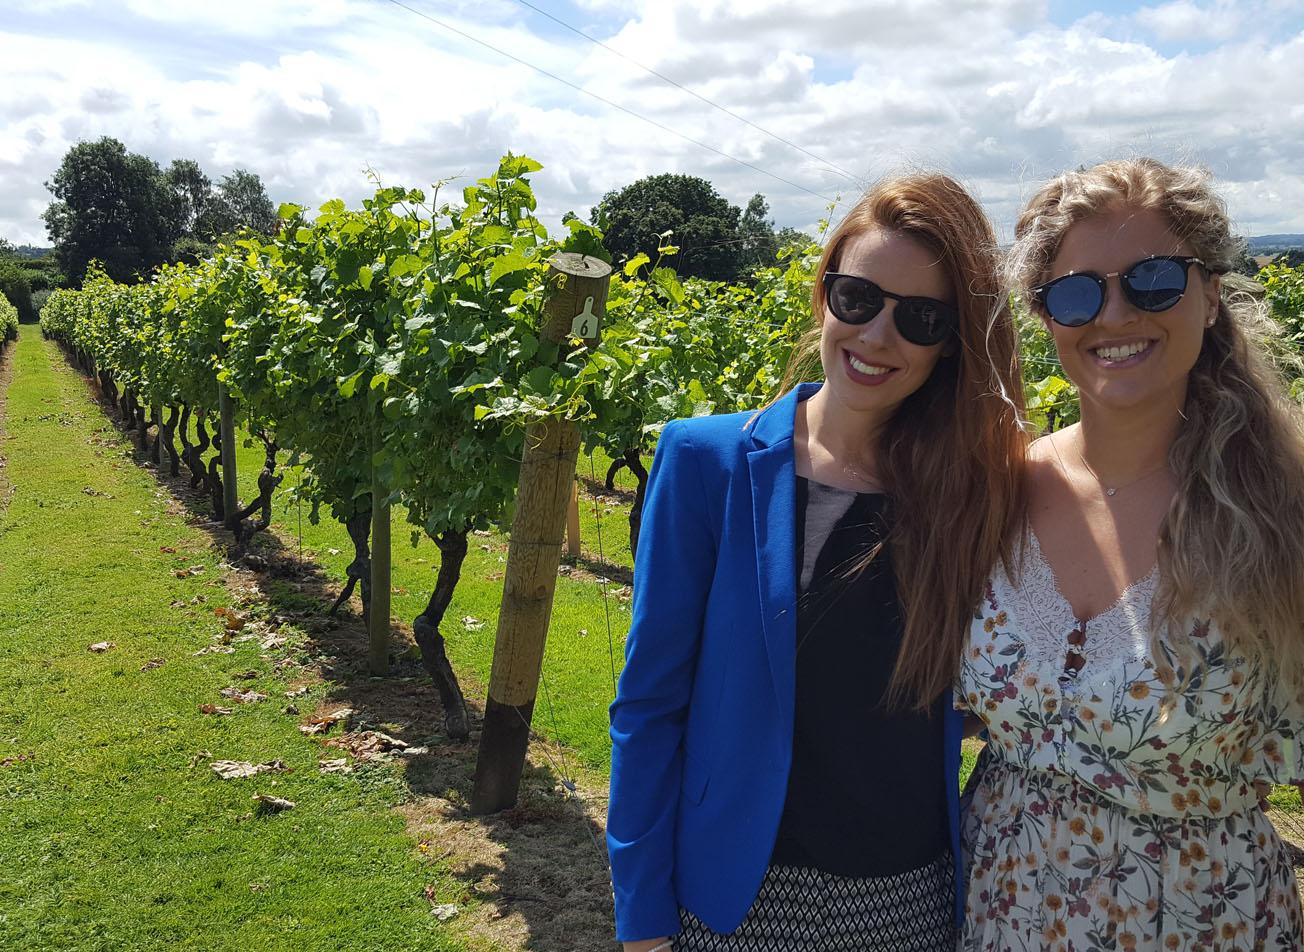 Two girls in vineyard